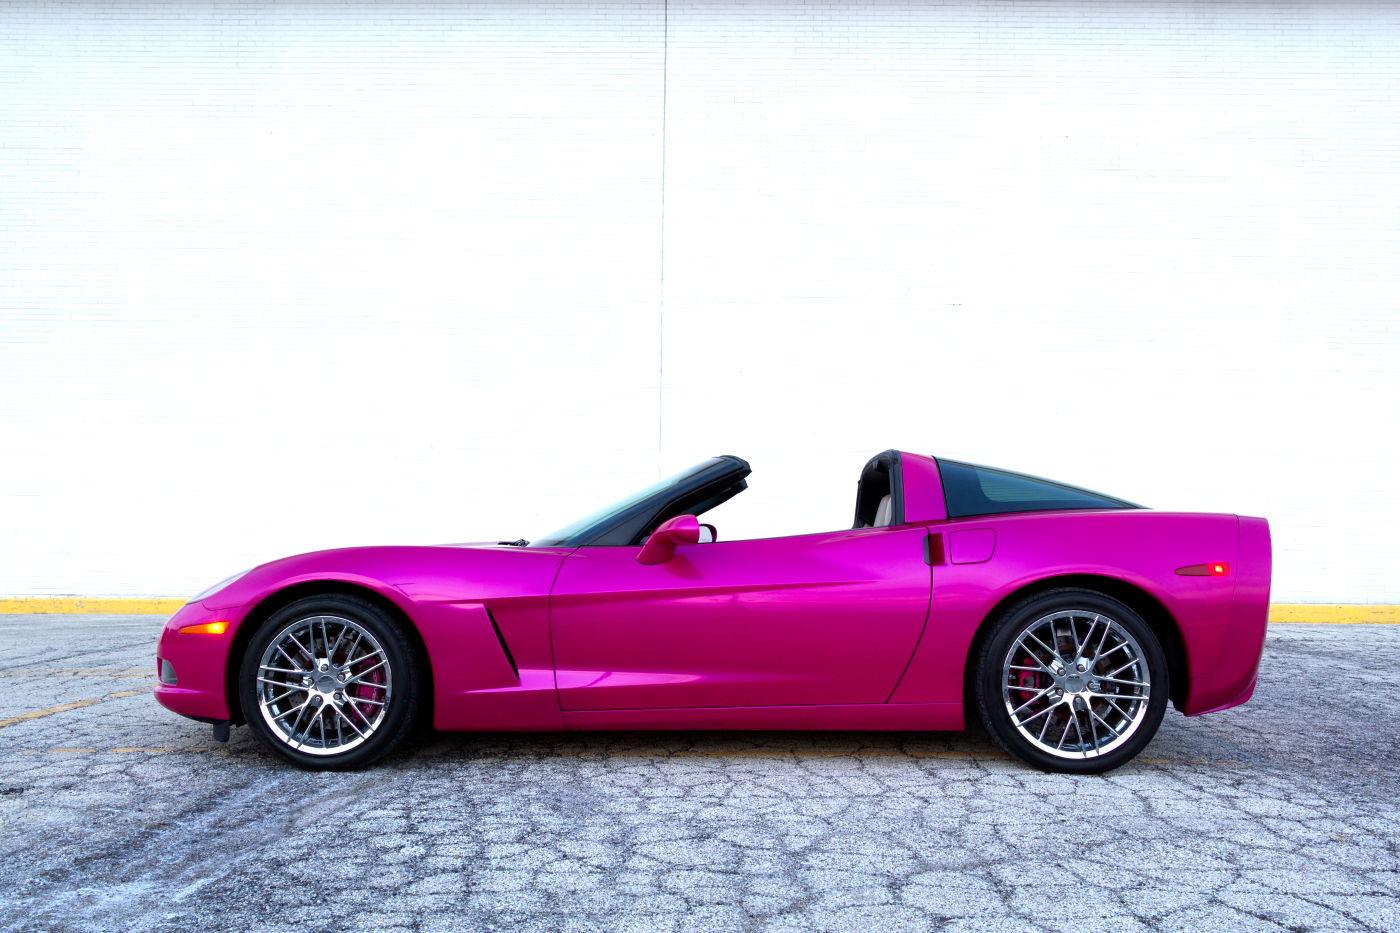 Fs 2006 C6 Corvette Hot Pink Chicago Camaro5 Chevy